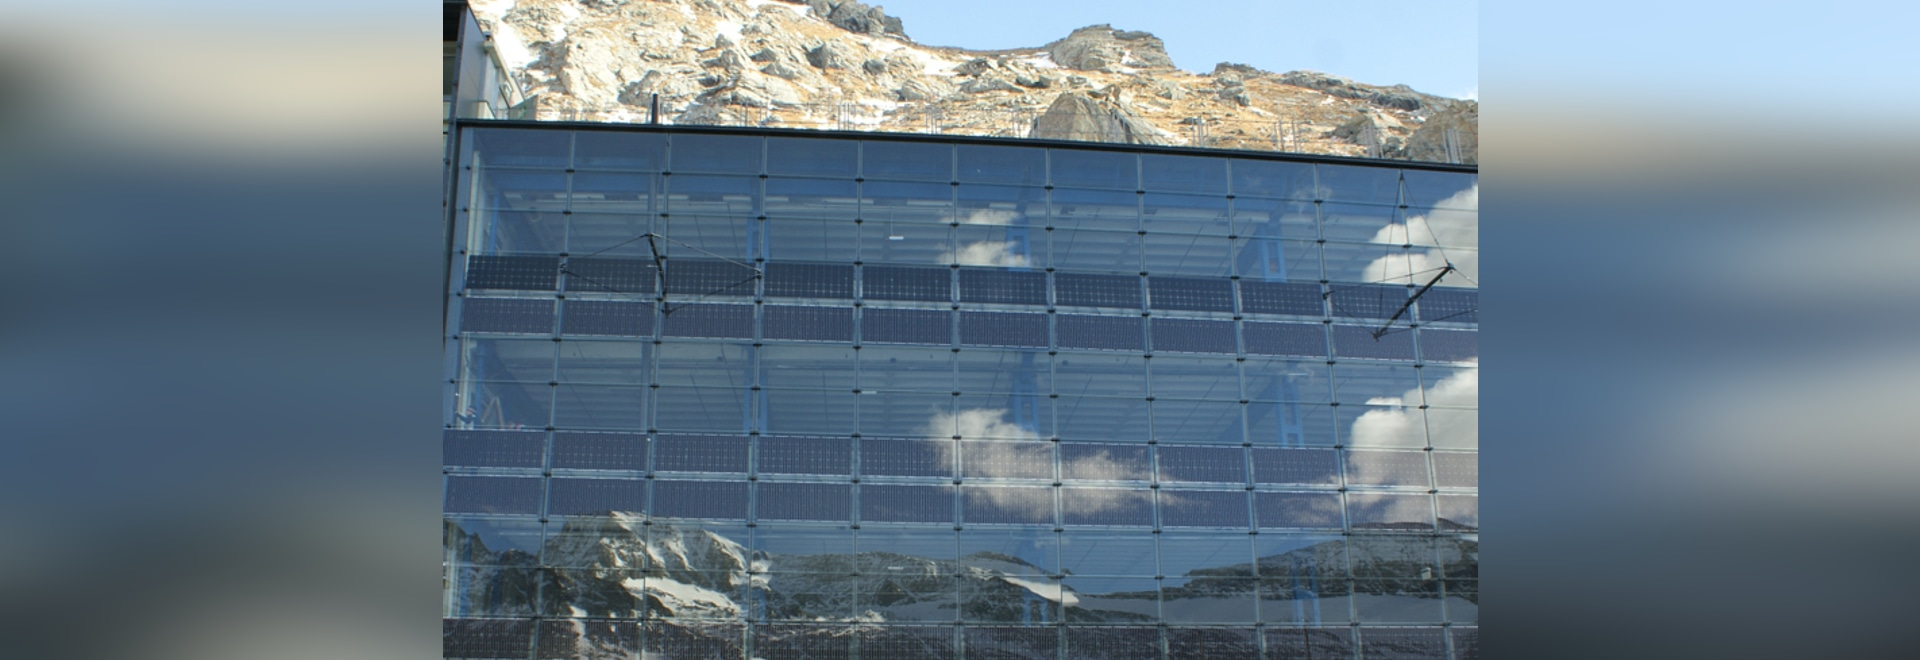 Photovoltaics para preservar su majestad